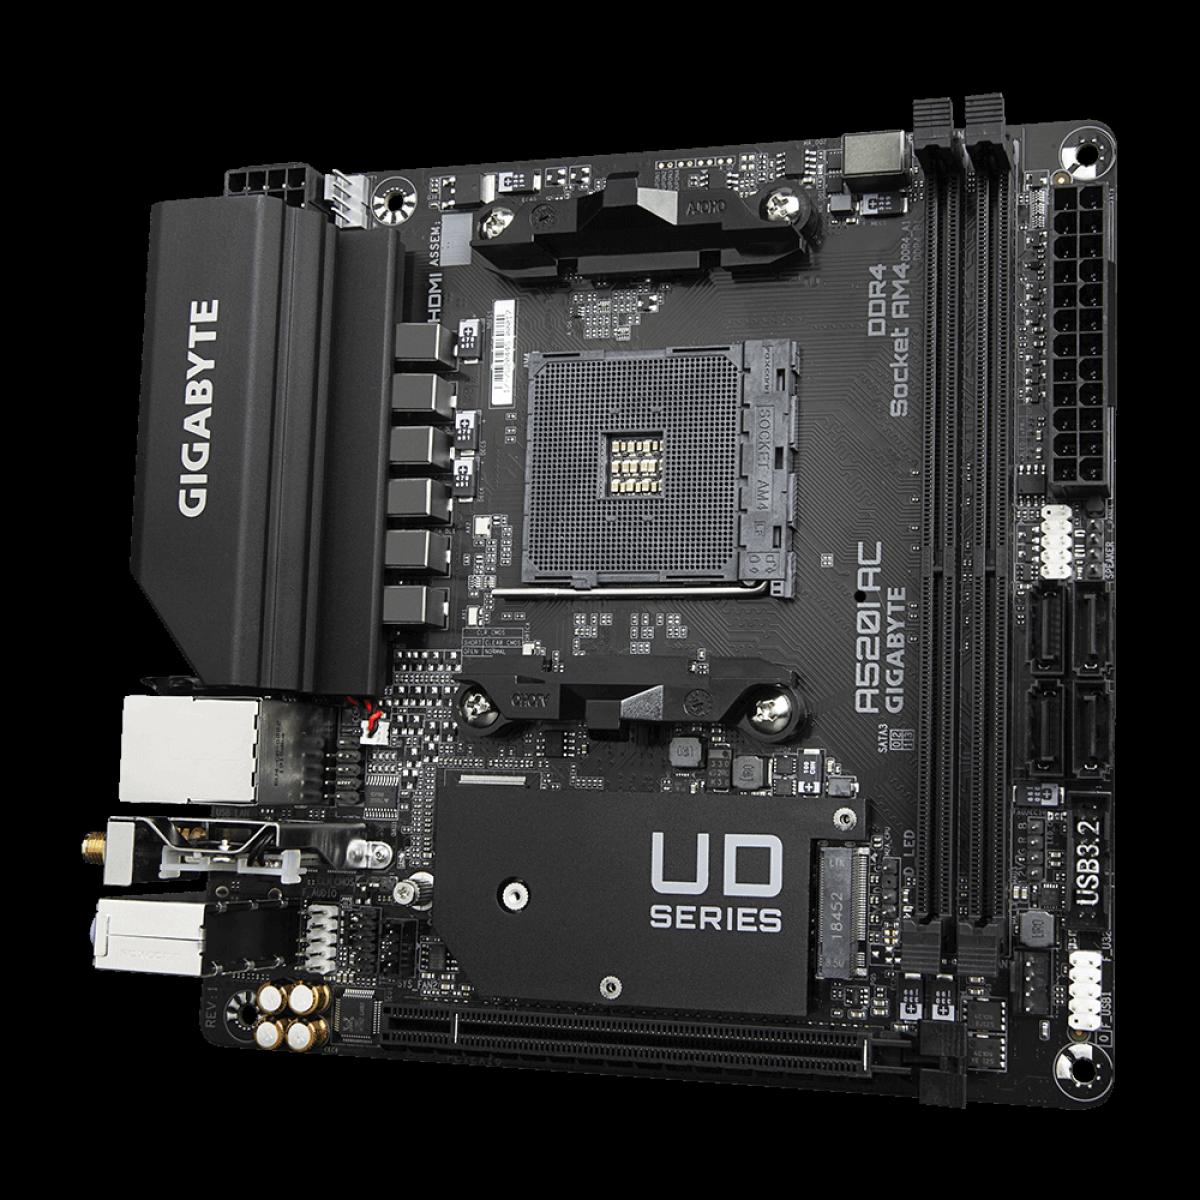 Placa Mãe Gigabyte A520I AC, Chipset A520, AMD AM4, Wi-Fi, Mini-ITX, DDR4, 9MA52IAC-00-11